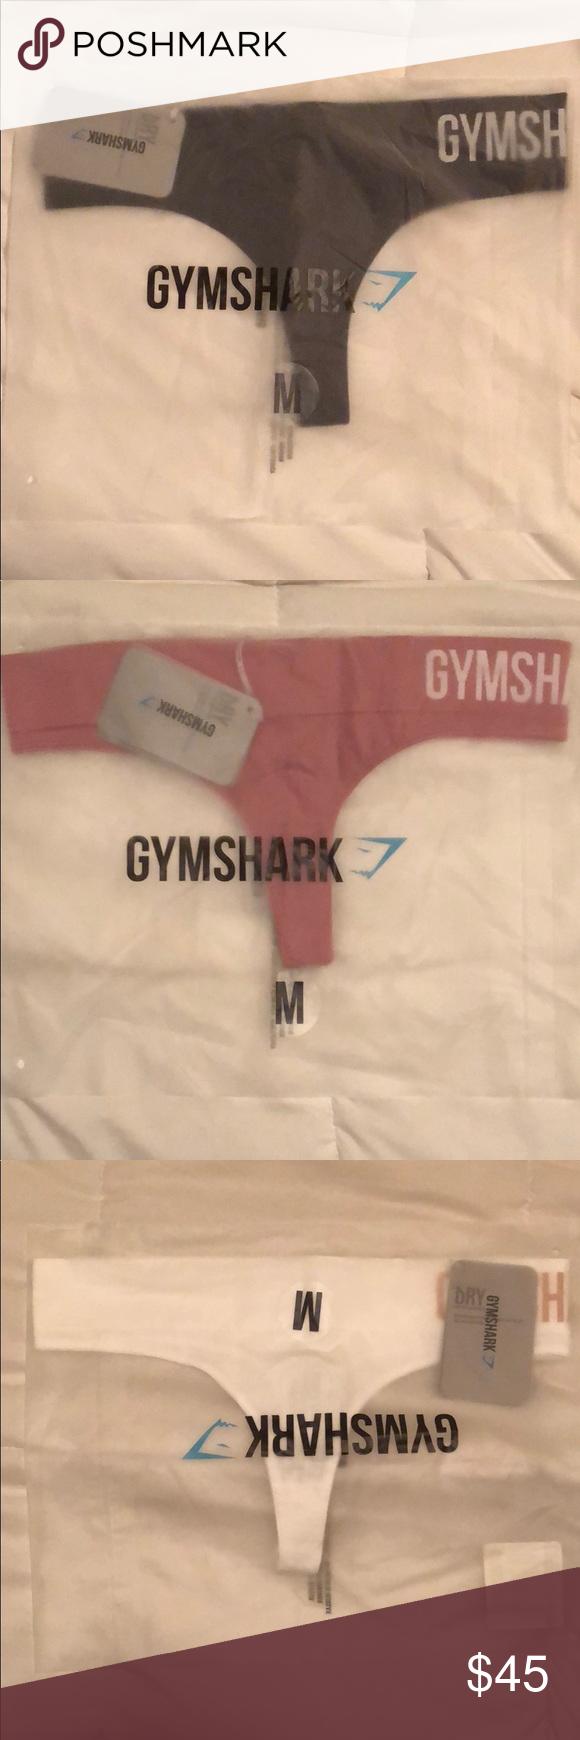 e4a031dc2b2 Gymshark Seamless Thong Medium (Black